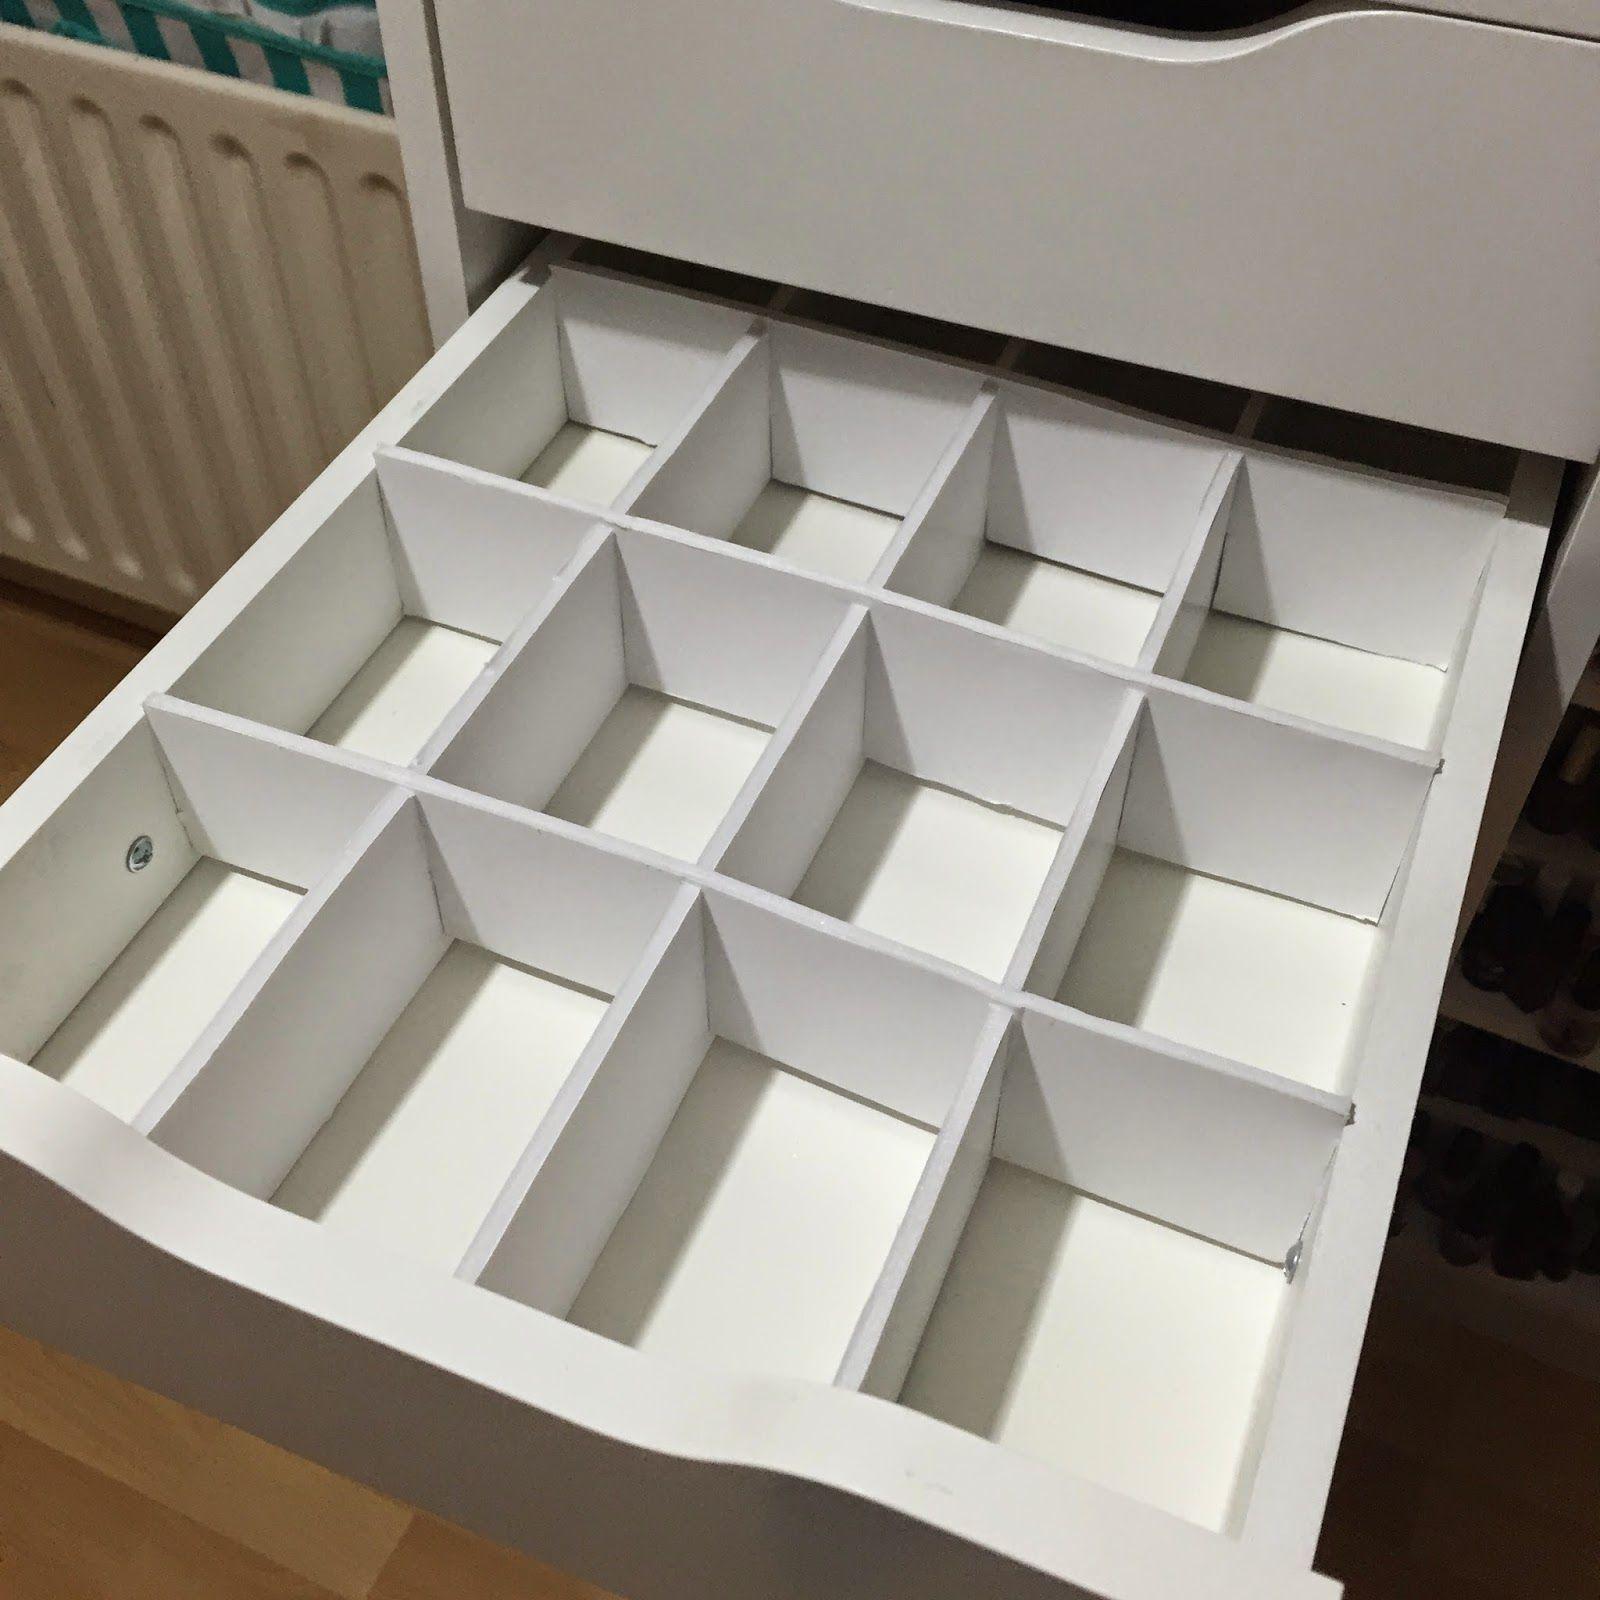 totalmakeupaddict makeup storage inspiration 1 drawer dividers feat ikea alex unit diy. Black Bedroom Furniture Sets. Home Design Ideas